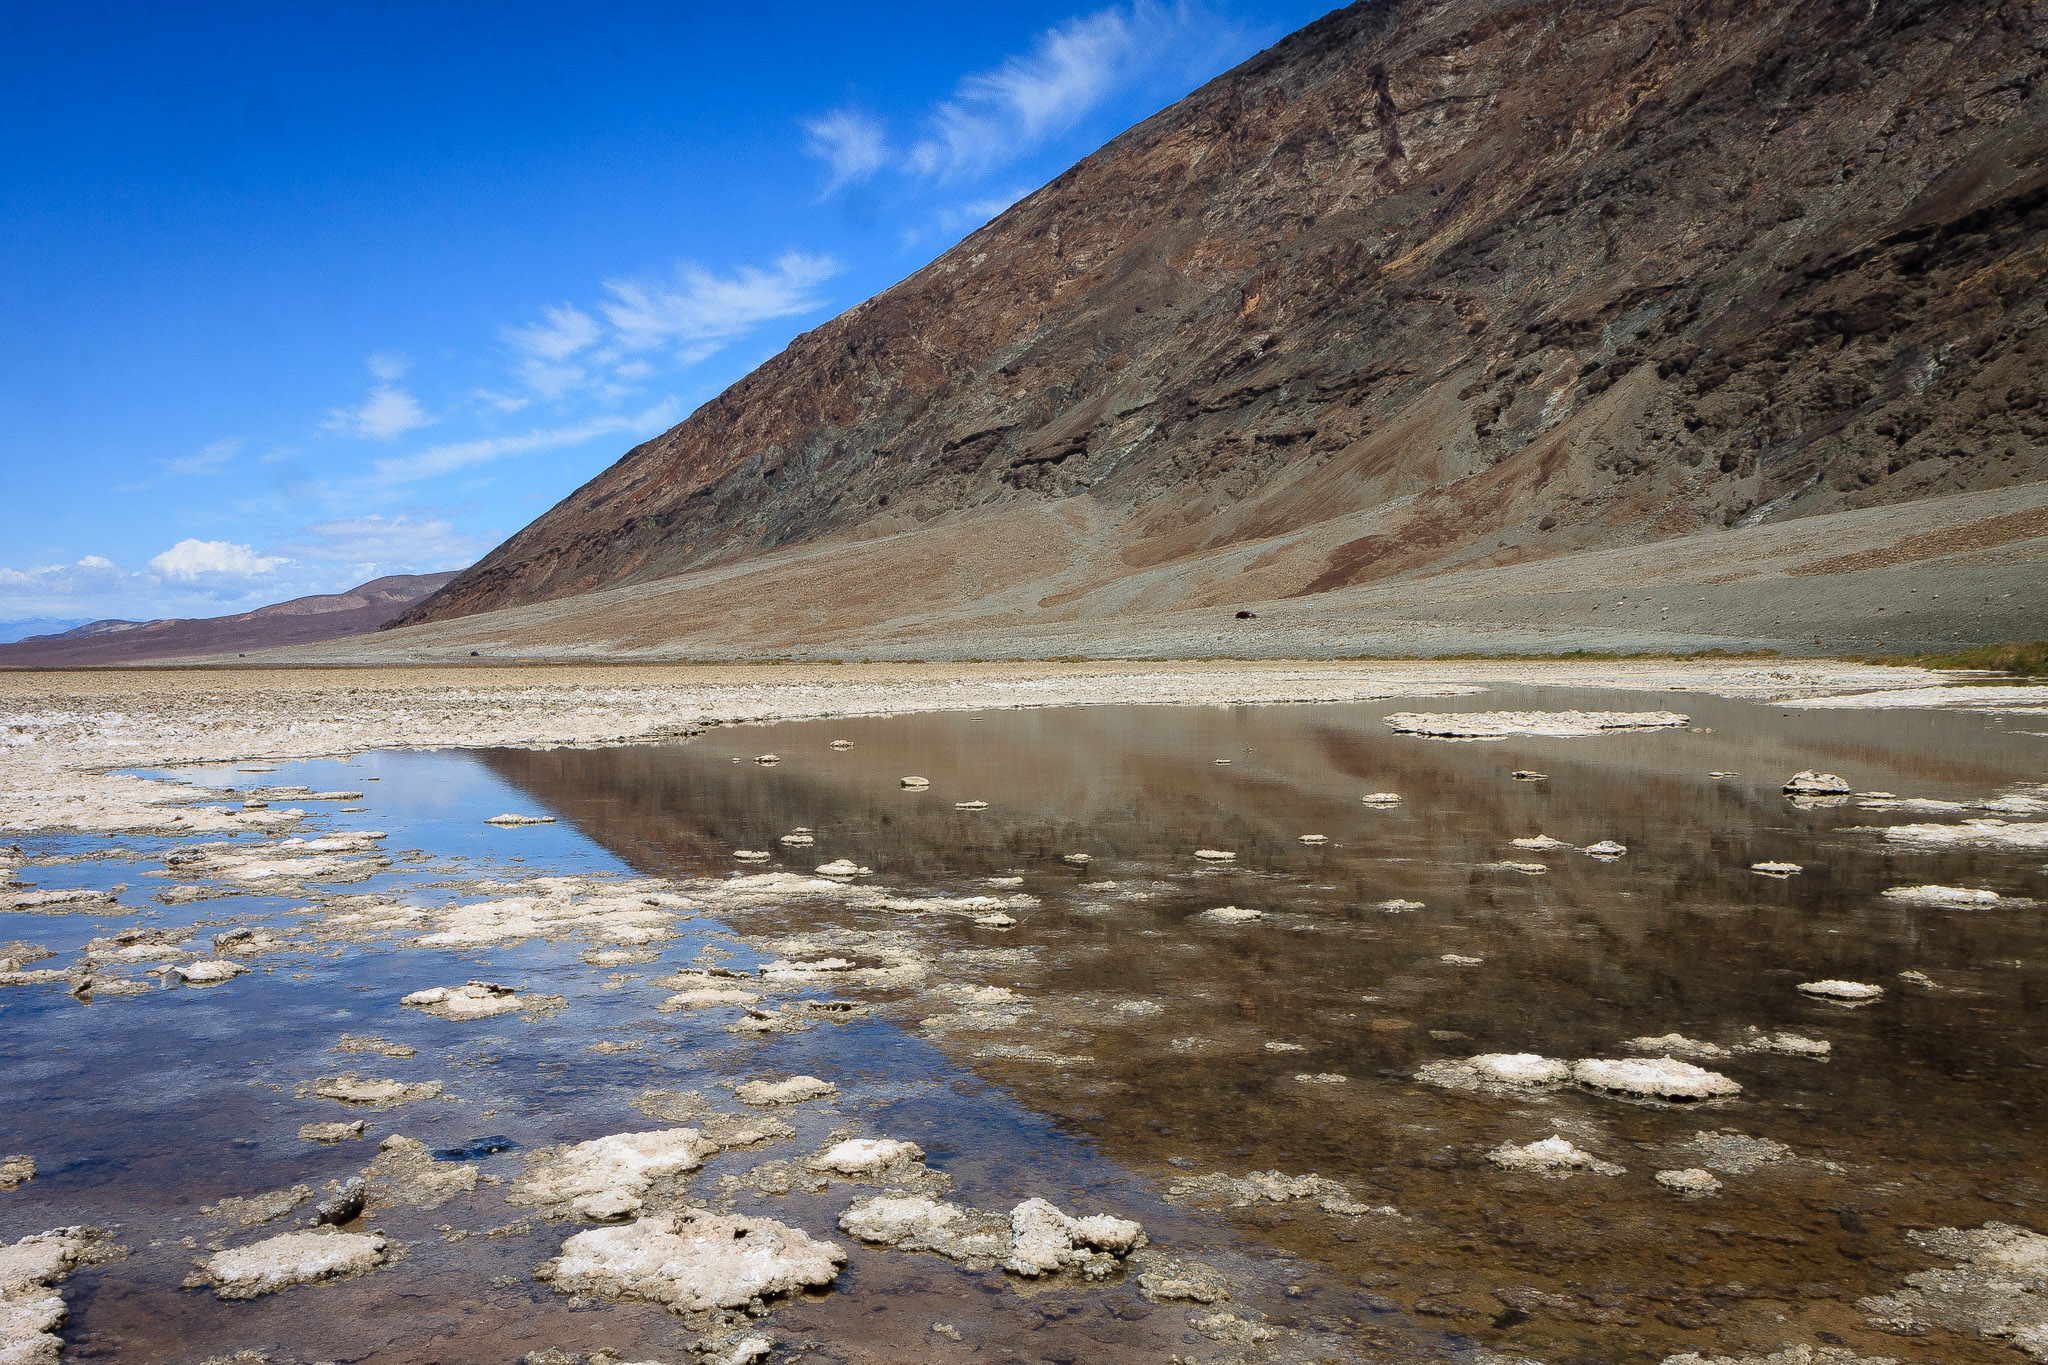 Wet Badwater Basin, Death Valley, USA